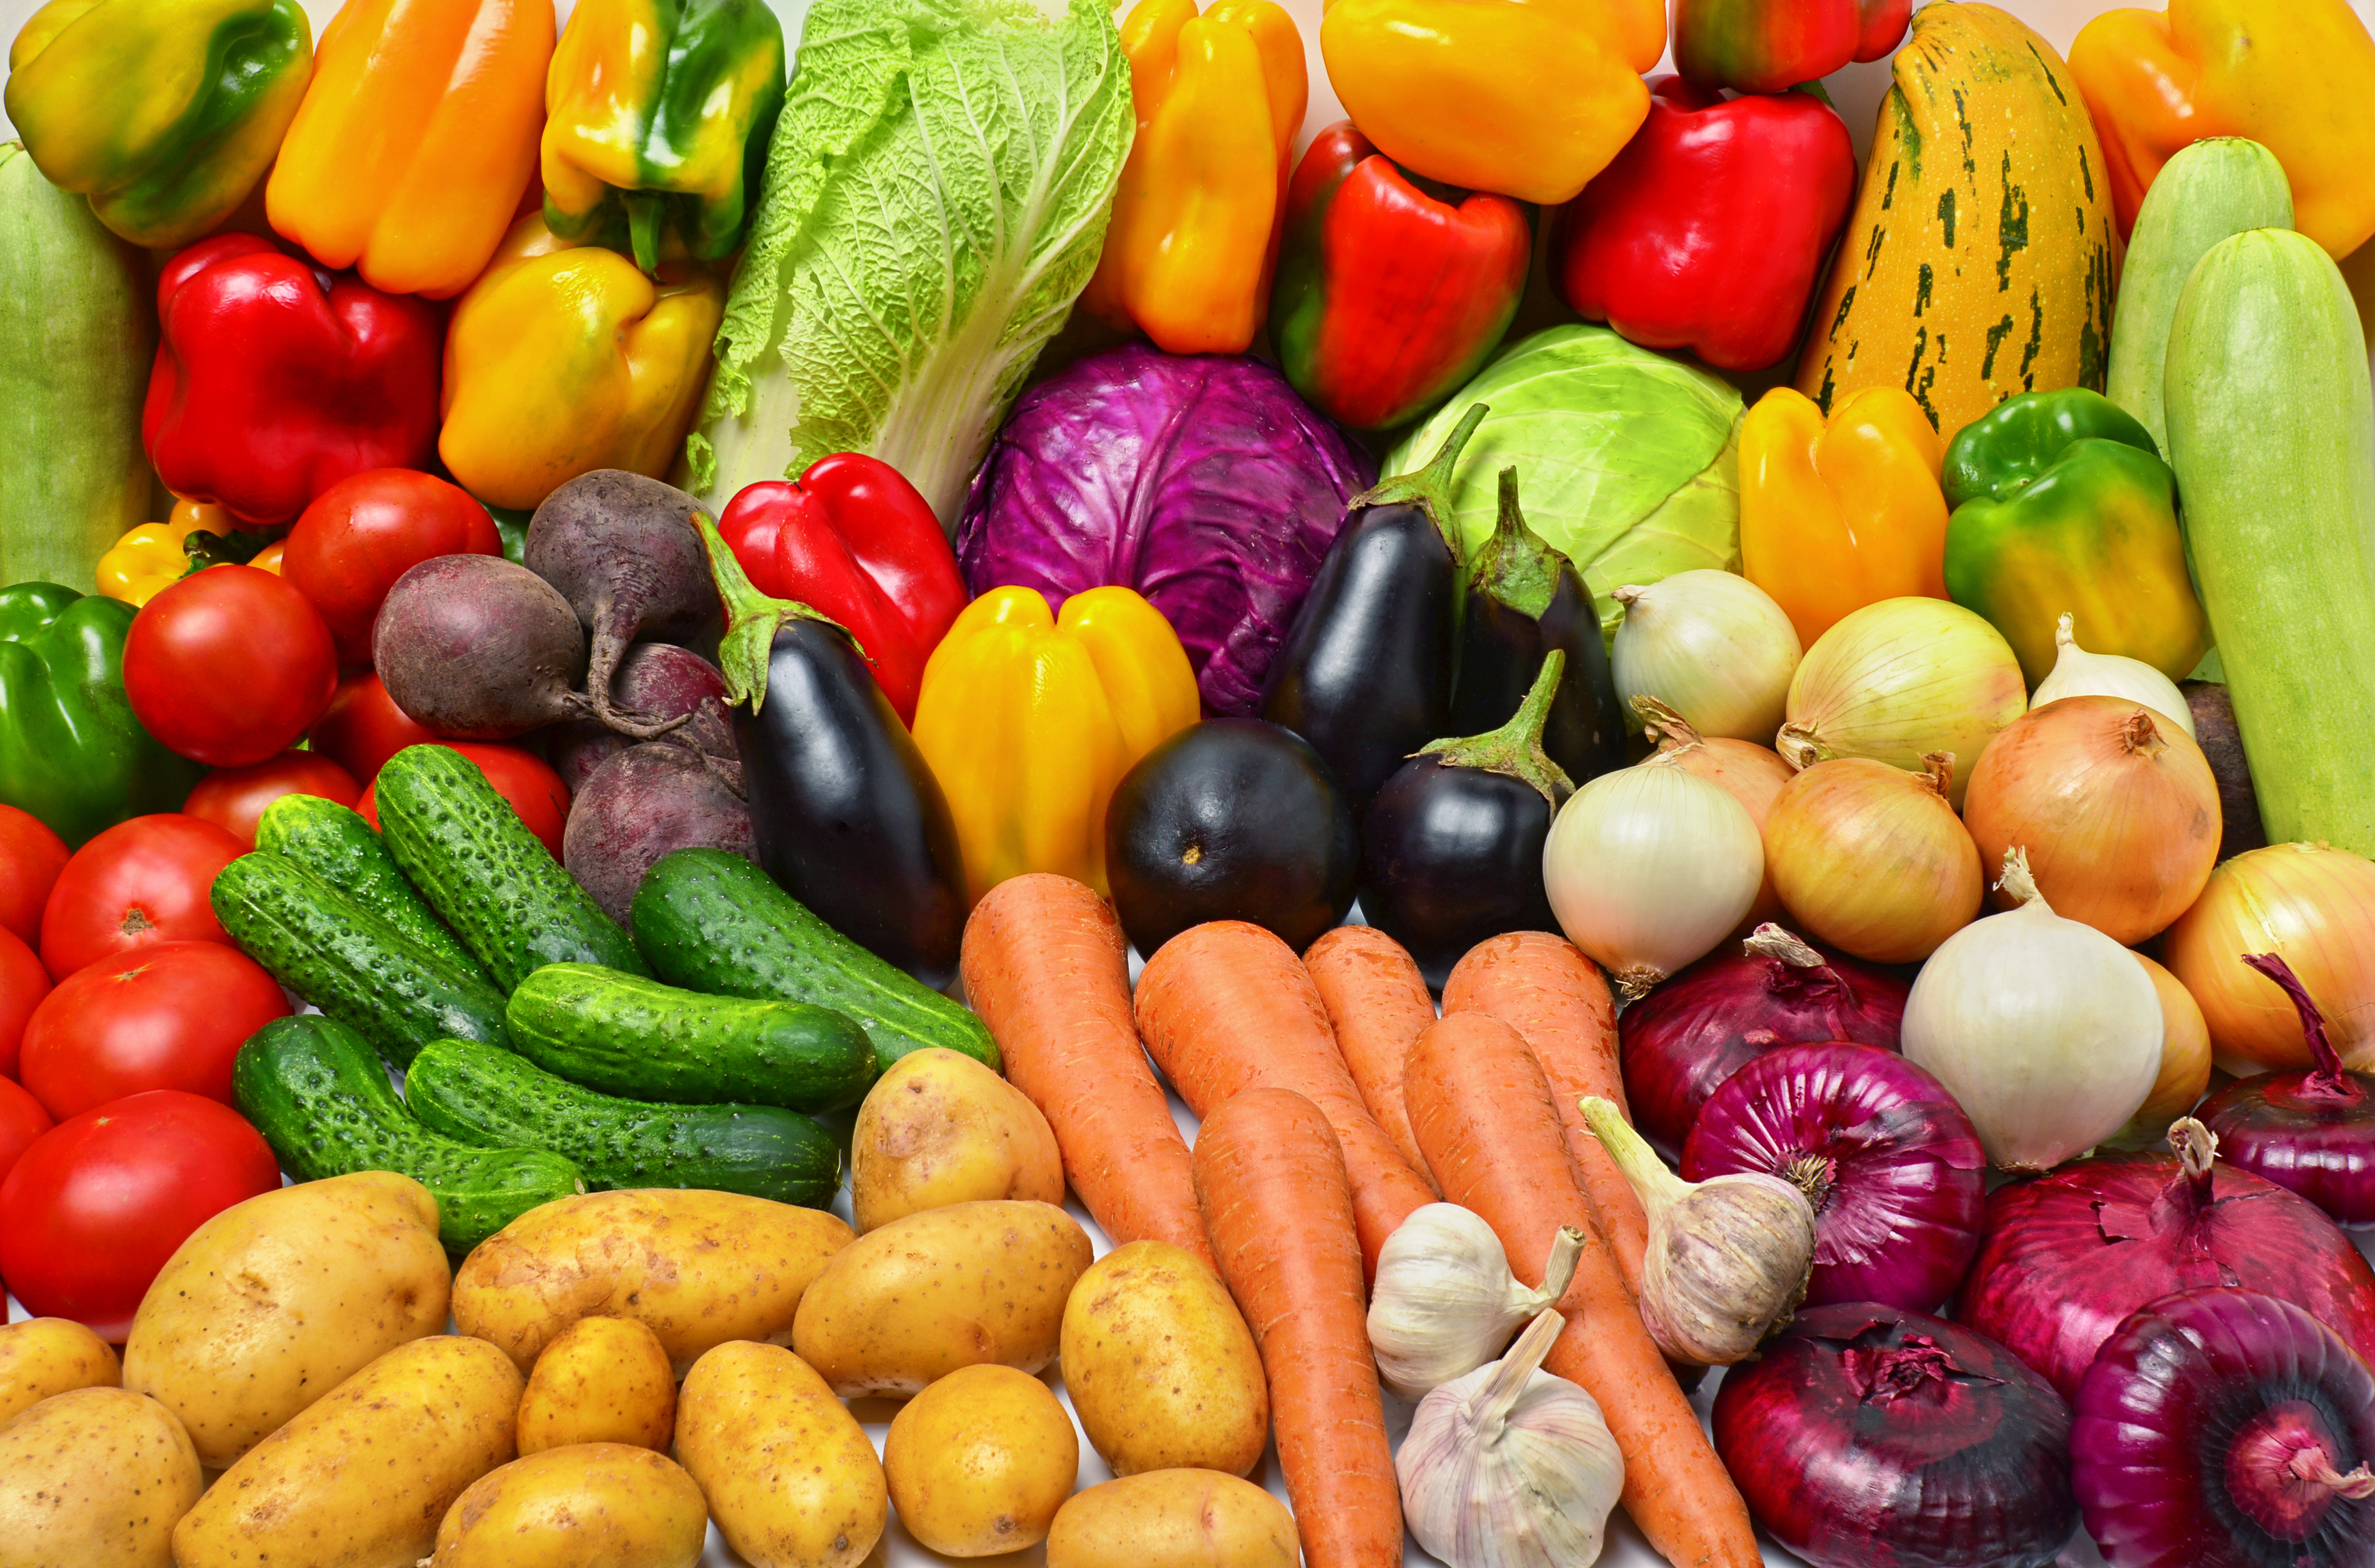 HQ Vegetables Wallpapers | File 8102.77Kb